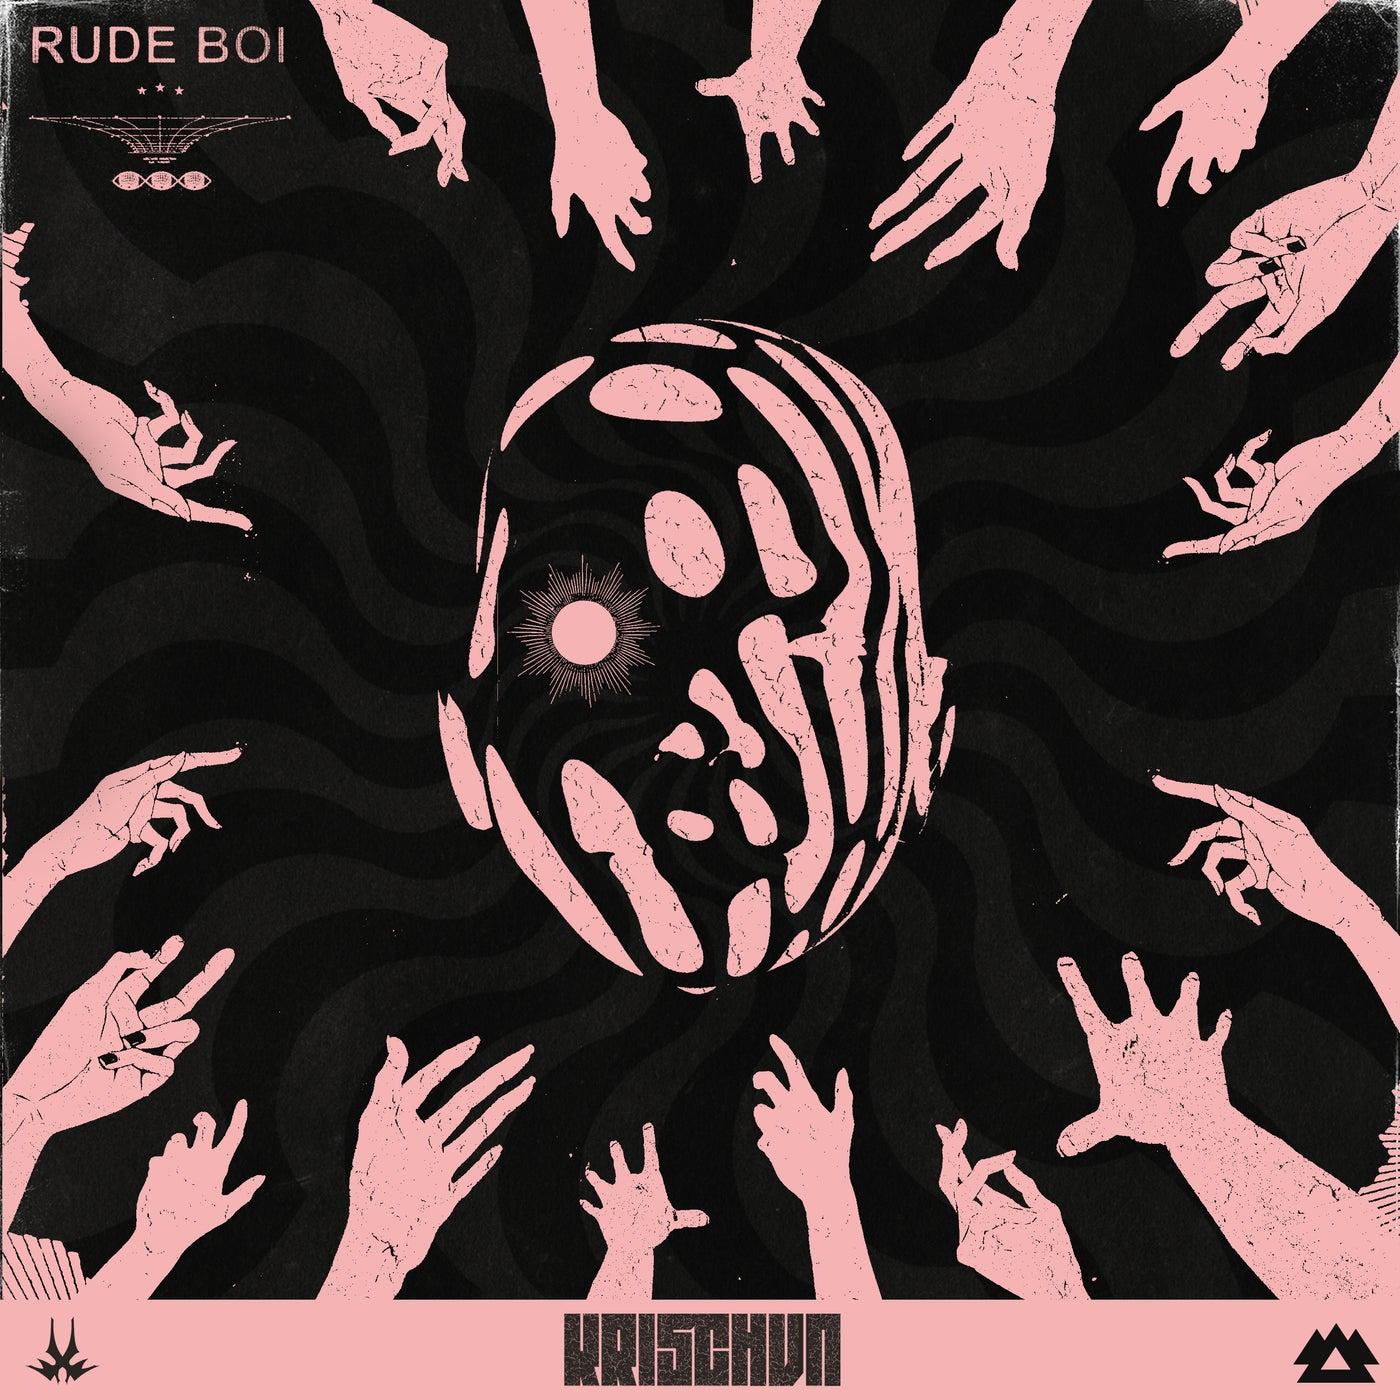 Rude Boi (Original Mix)